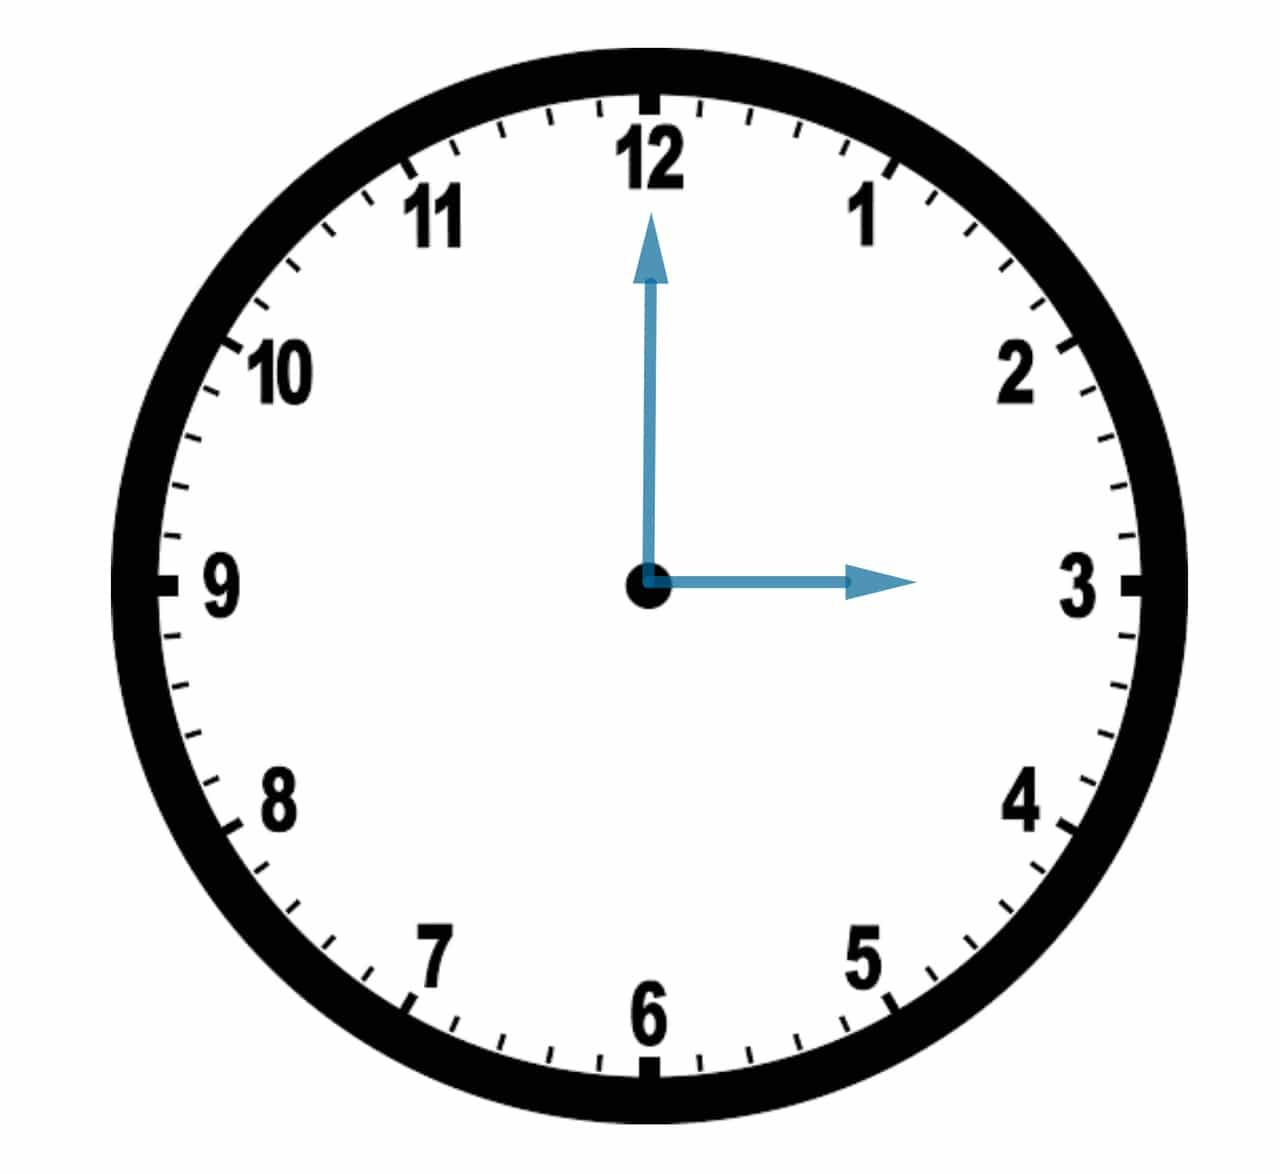 3 o clock